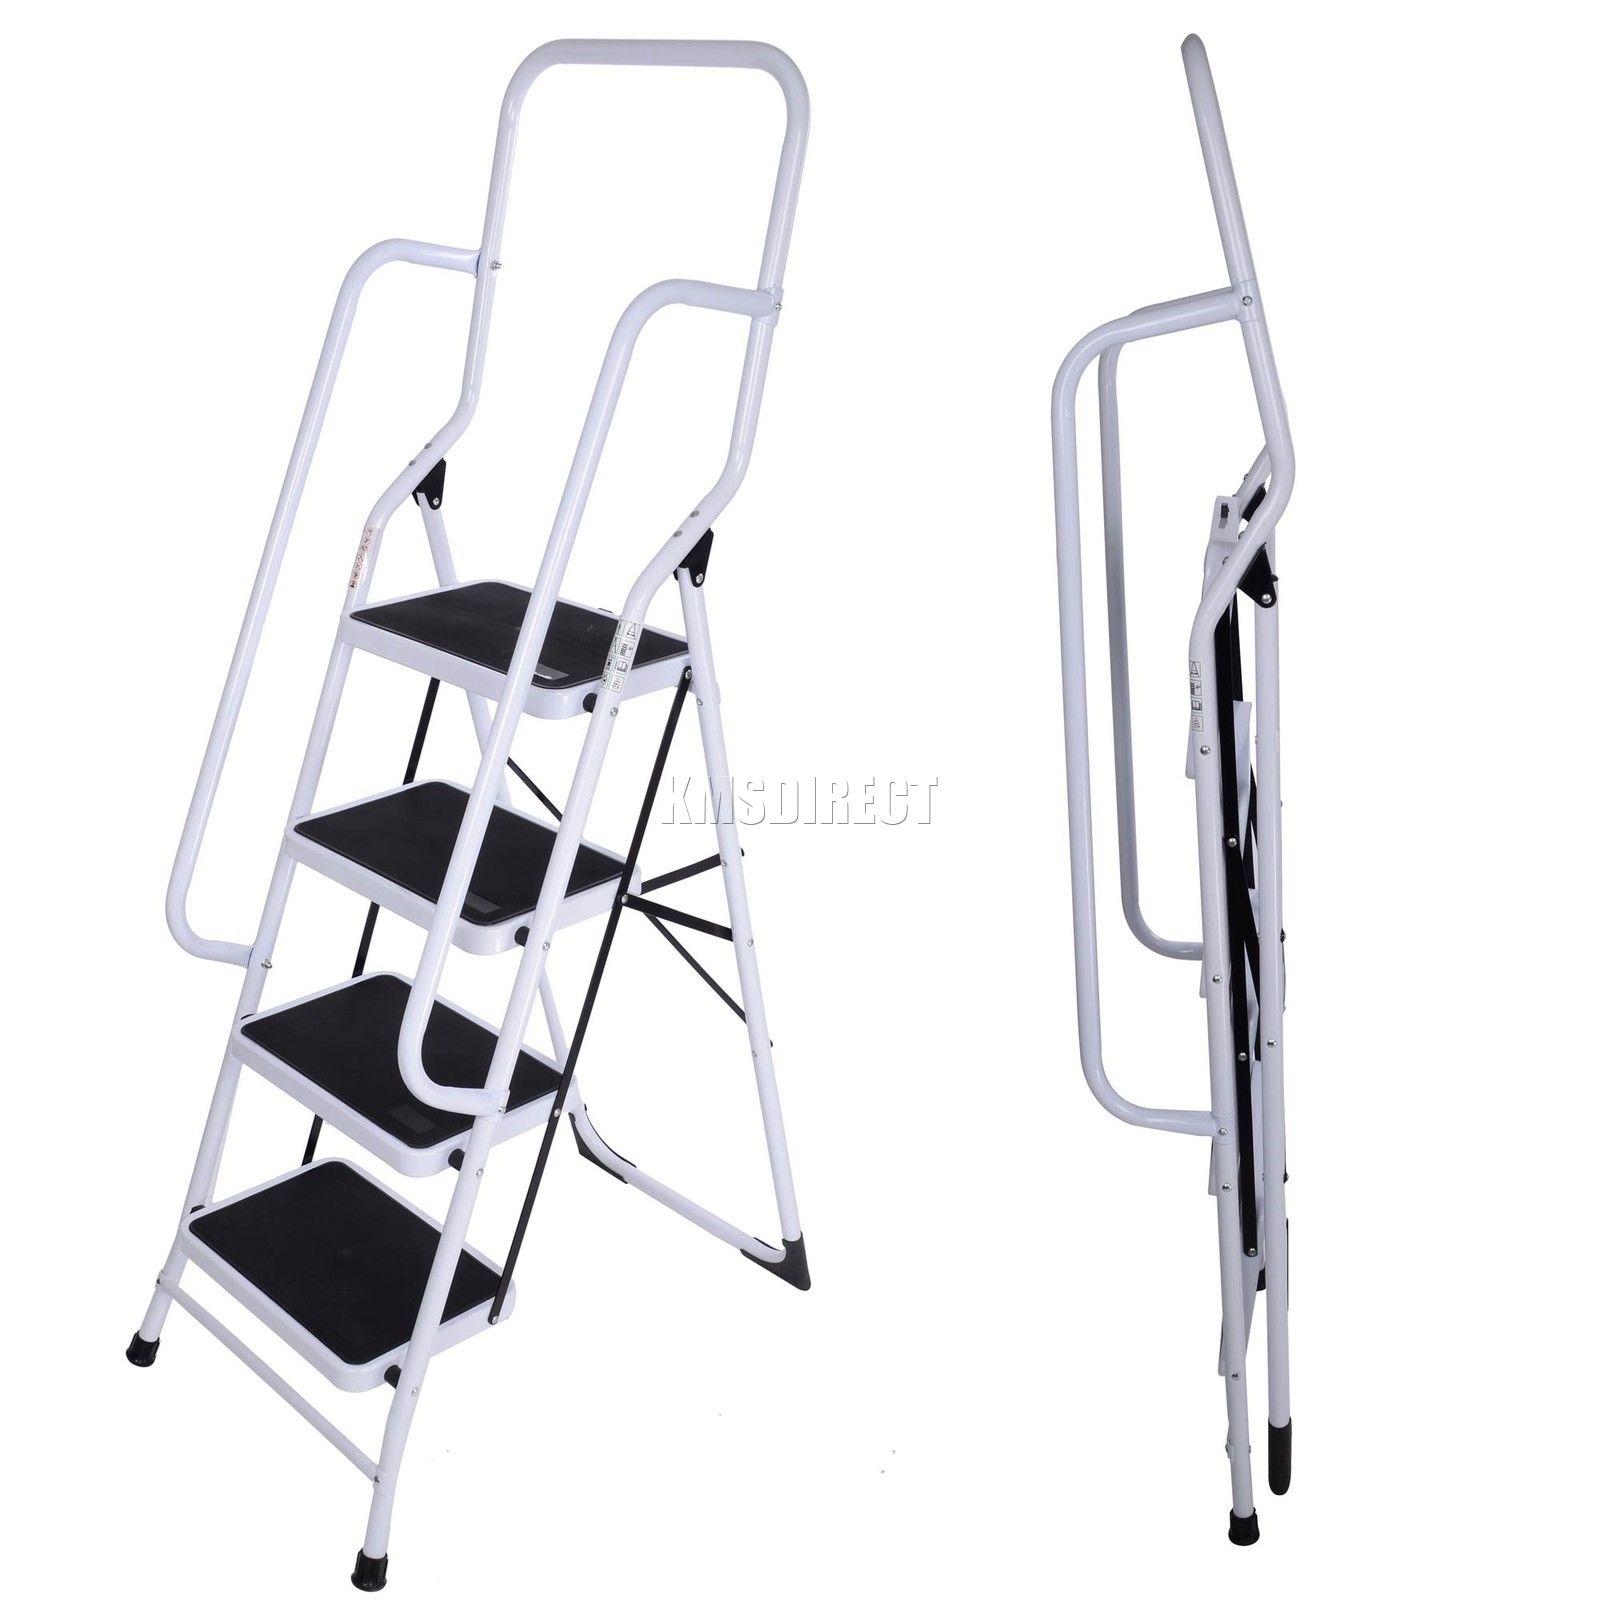 Foxhunter Foldable 4 Step Steel Non Slip Ladder Tread